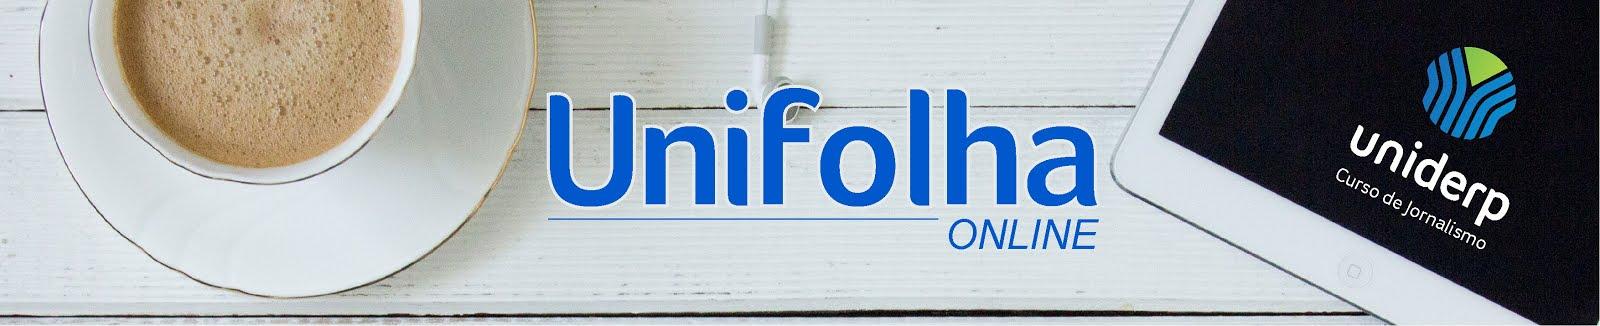 Unifolha Online